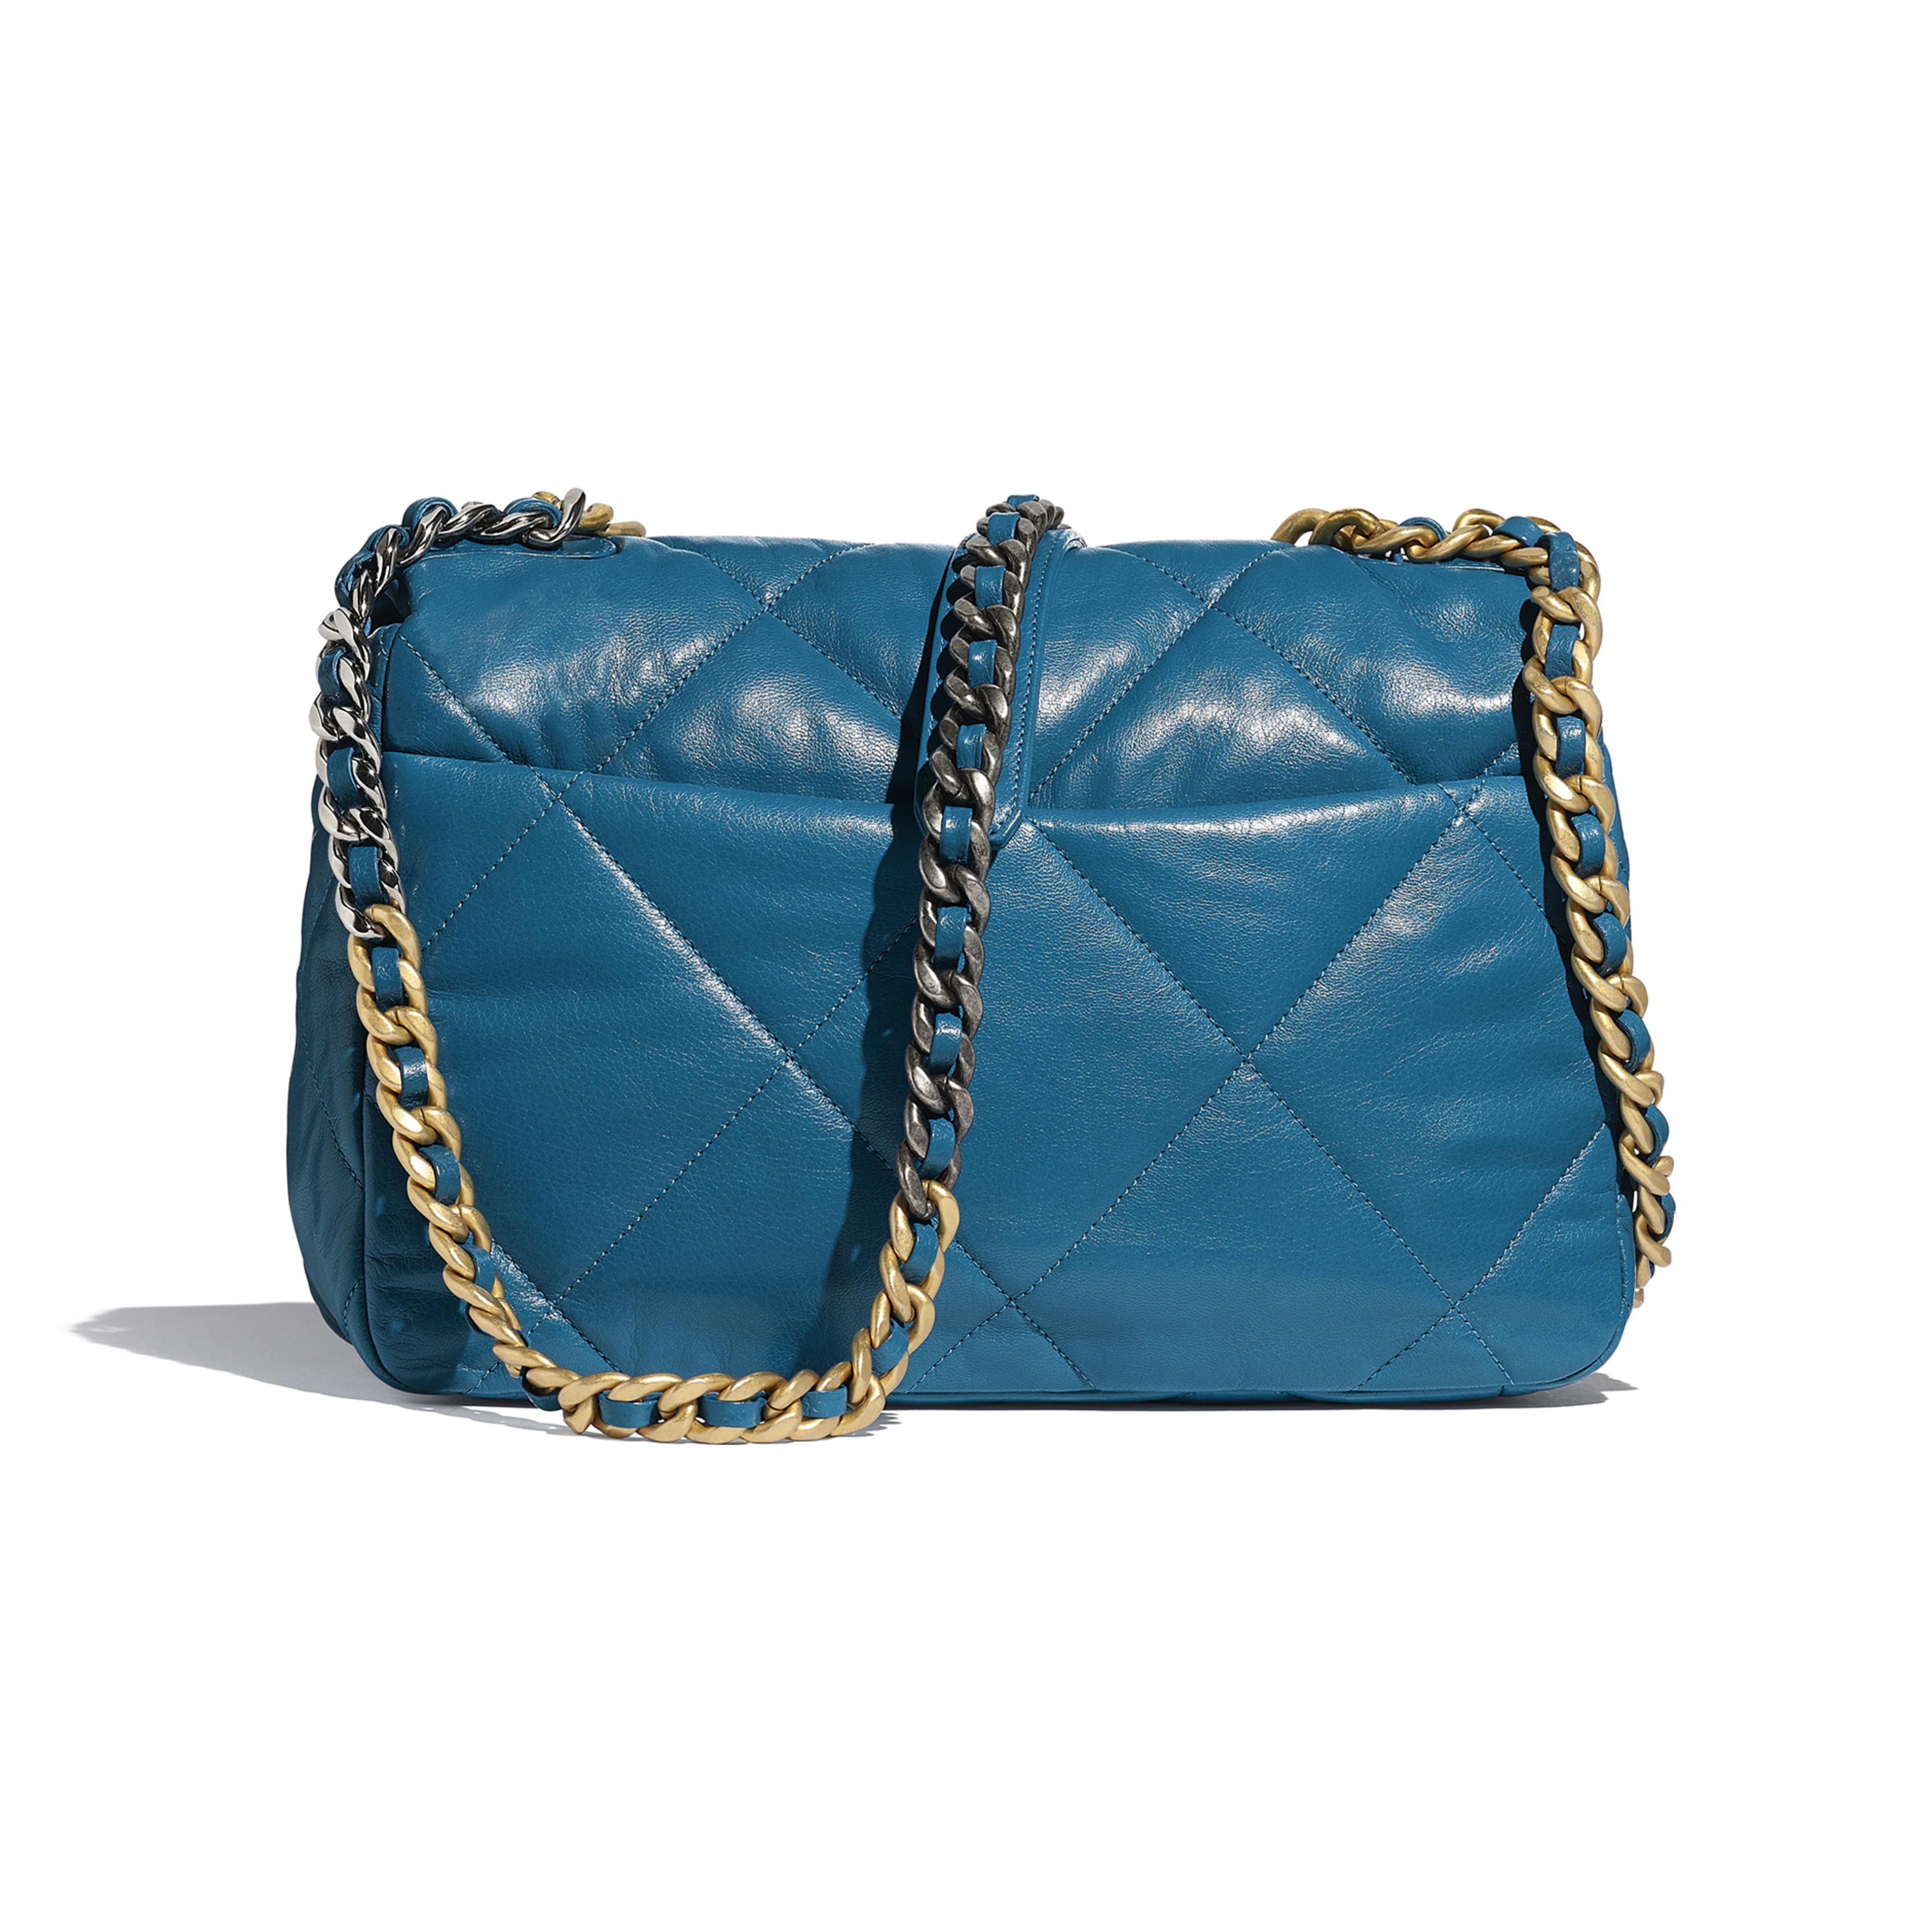 CHANEL 19 Large Flap Bag - Turquoise - Goatskin, Gold-Tone, Silver-Tone & Ruthenium-Finish Metal - Alternative view - see full sized version